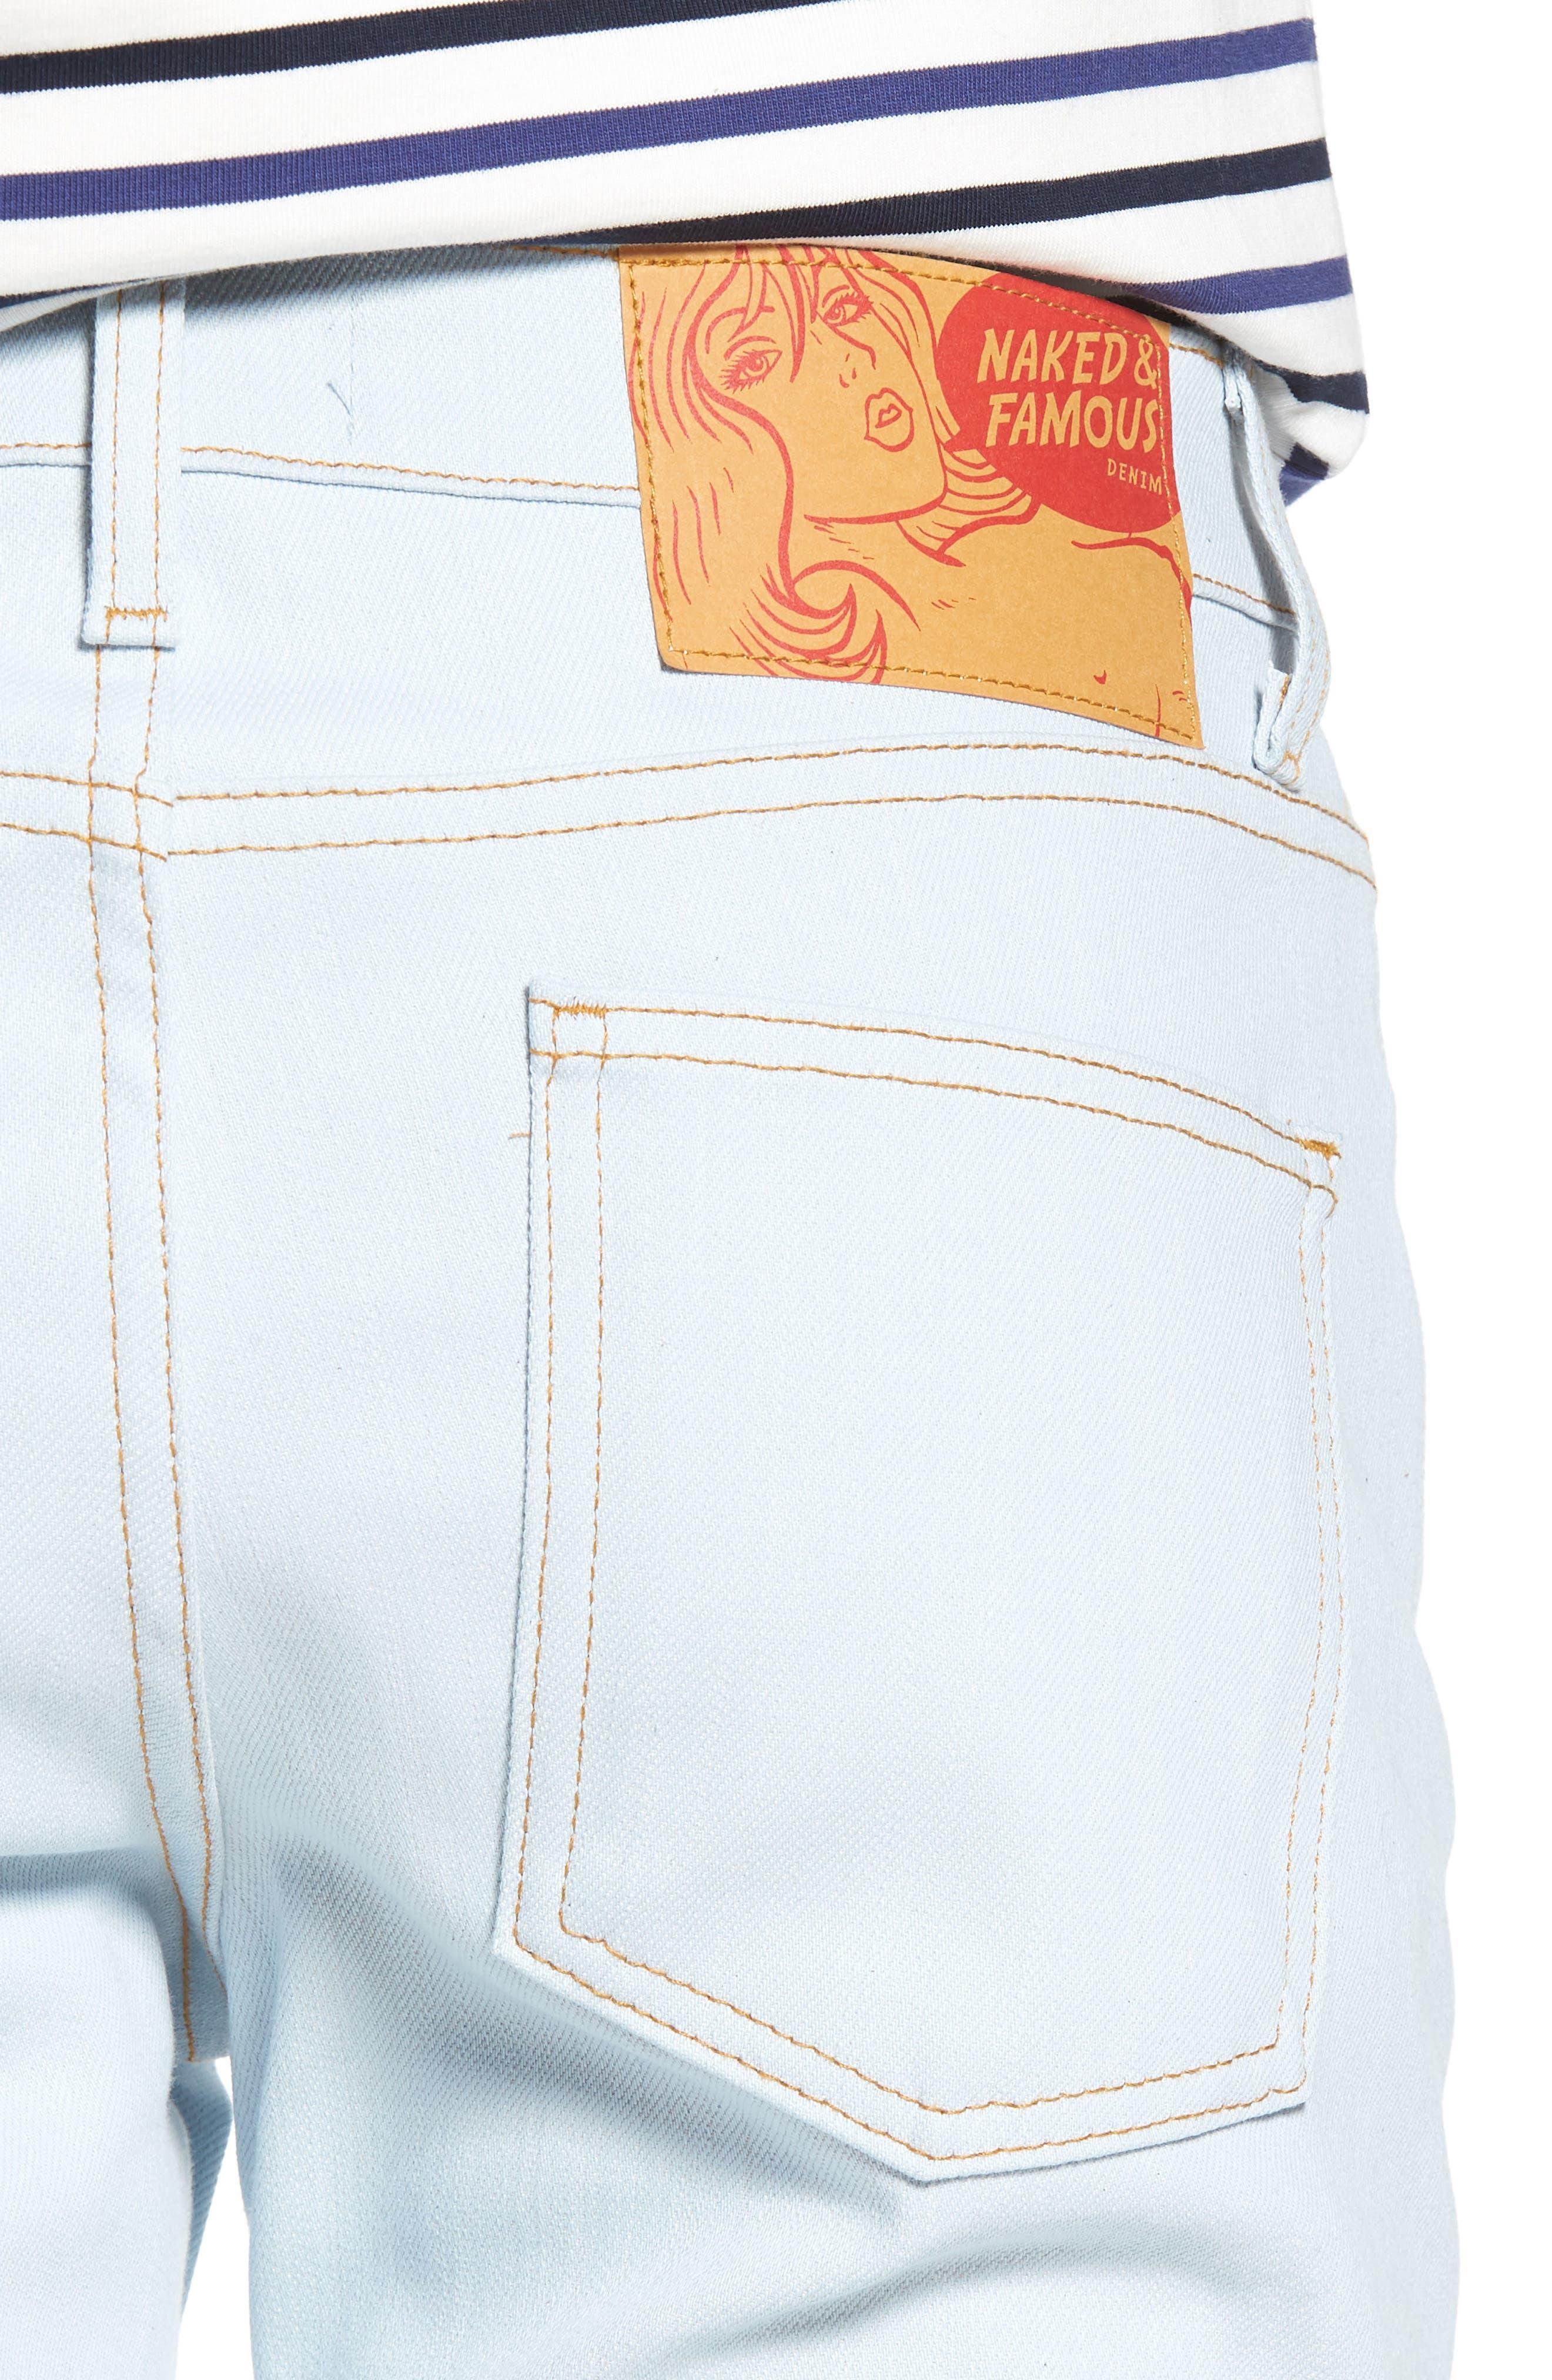 Naked & Famous Super Skinny Guy Skinny Fit Jeans,                             Alternate thumbnail 4, color,                             Powder Blue